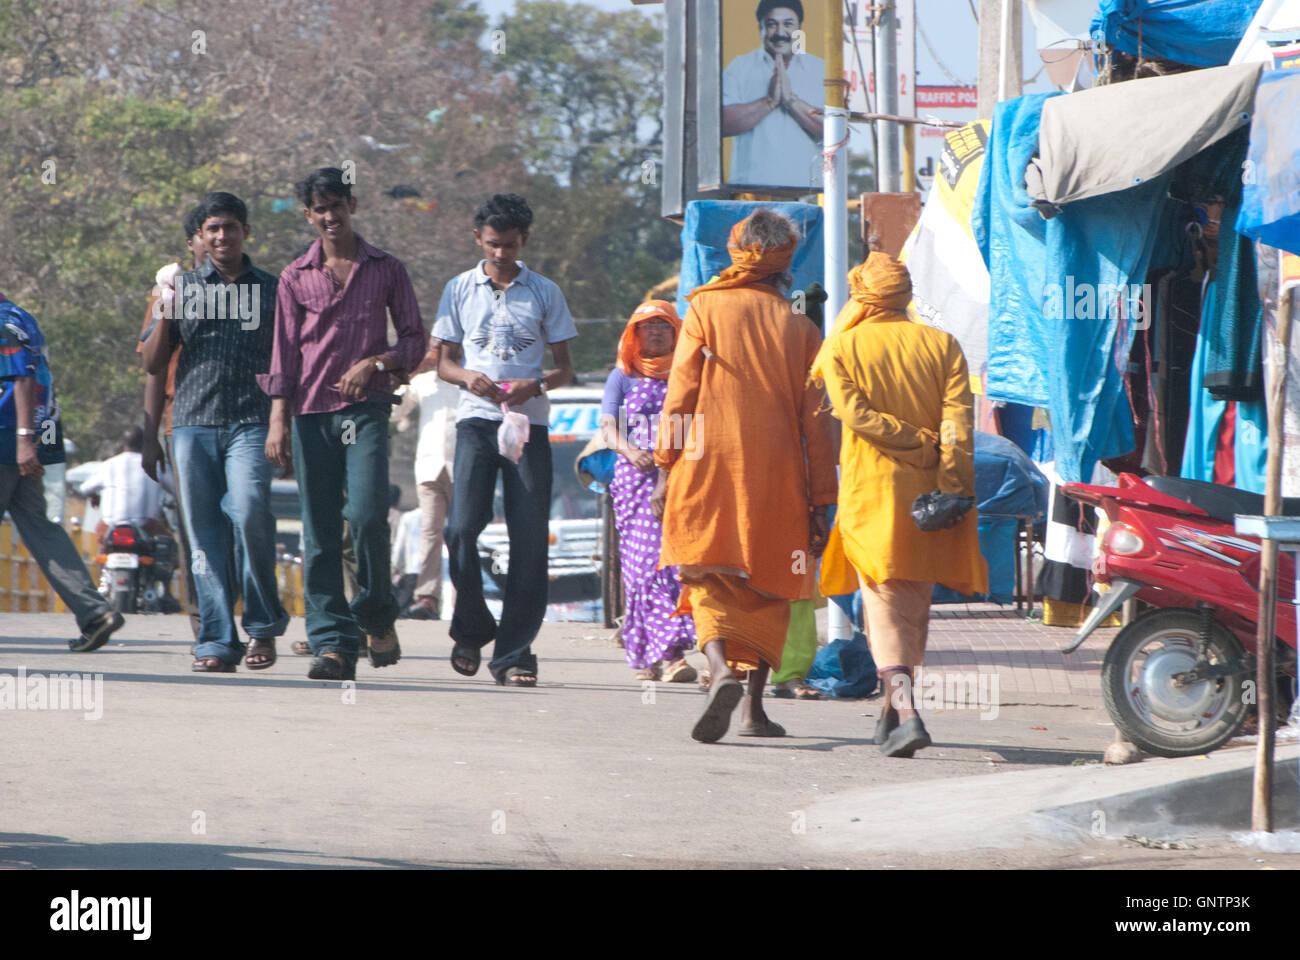 Old and the New generation at Ghandi Memorial, Kanyakumari, Tamil Nadu, Southern India, Asia - Stock Image